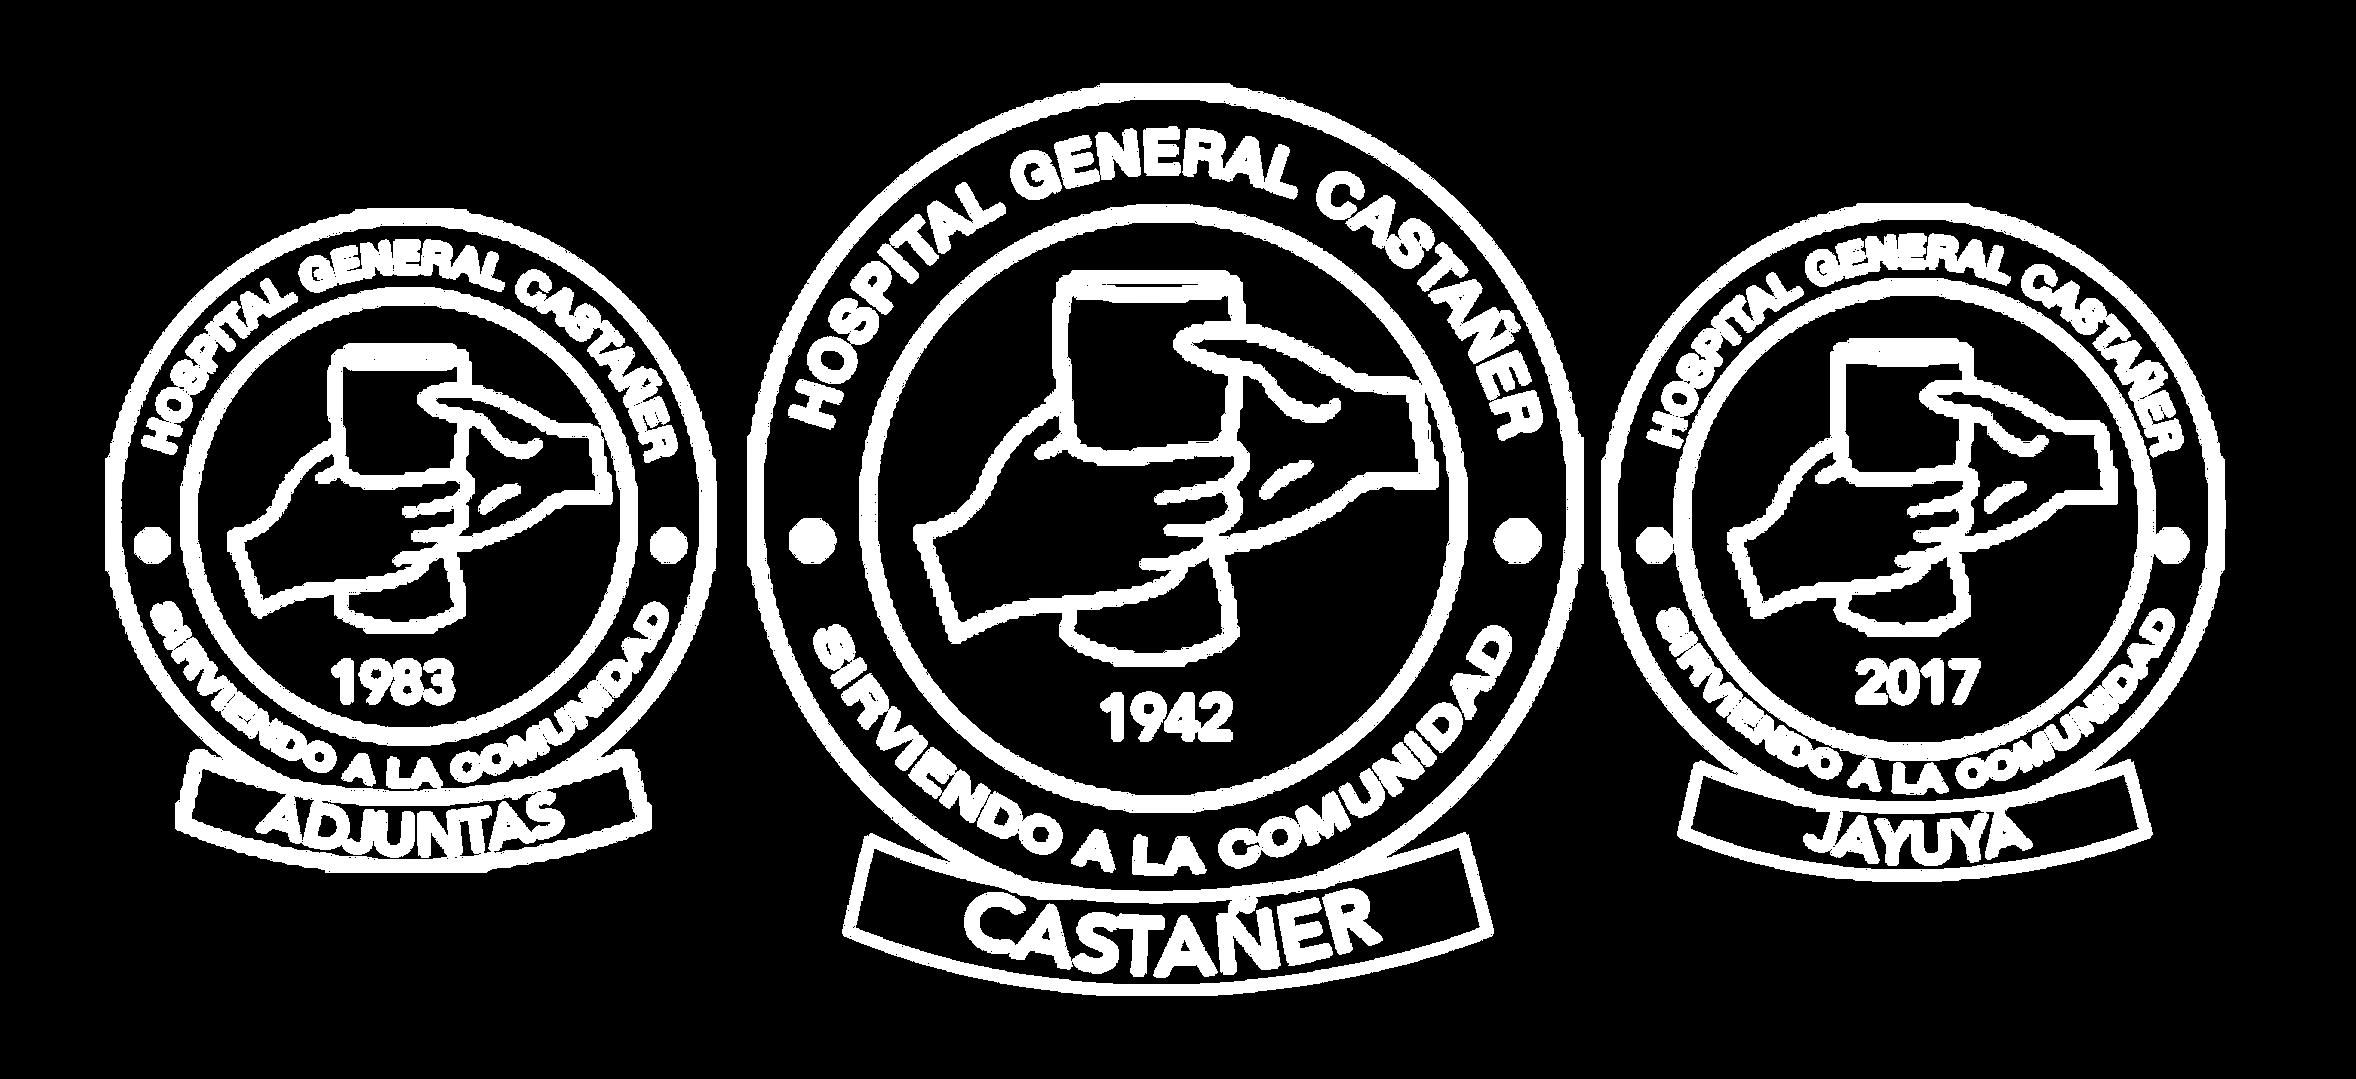 Hospital-general-castañer-LOGOS-con-re